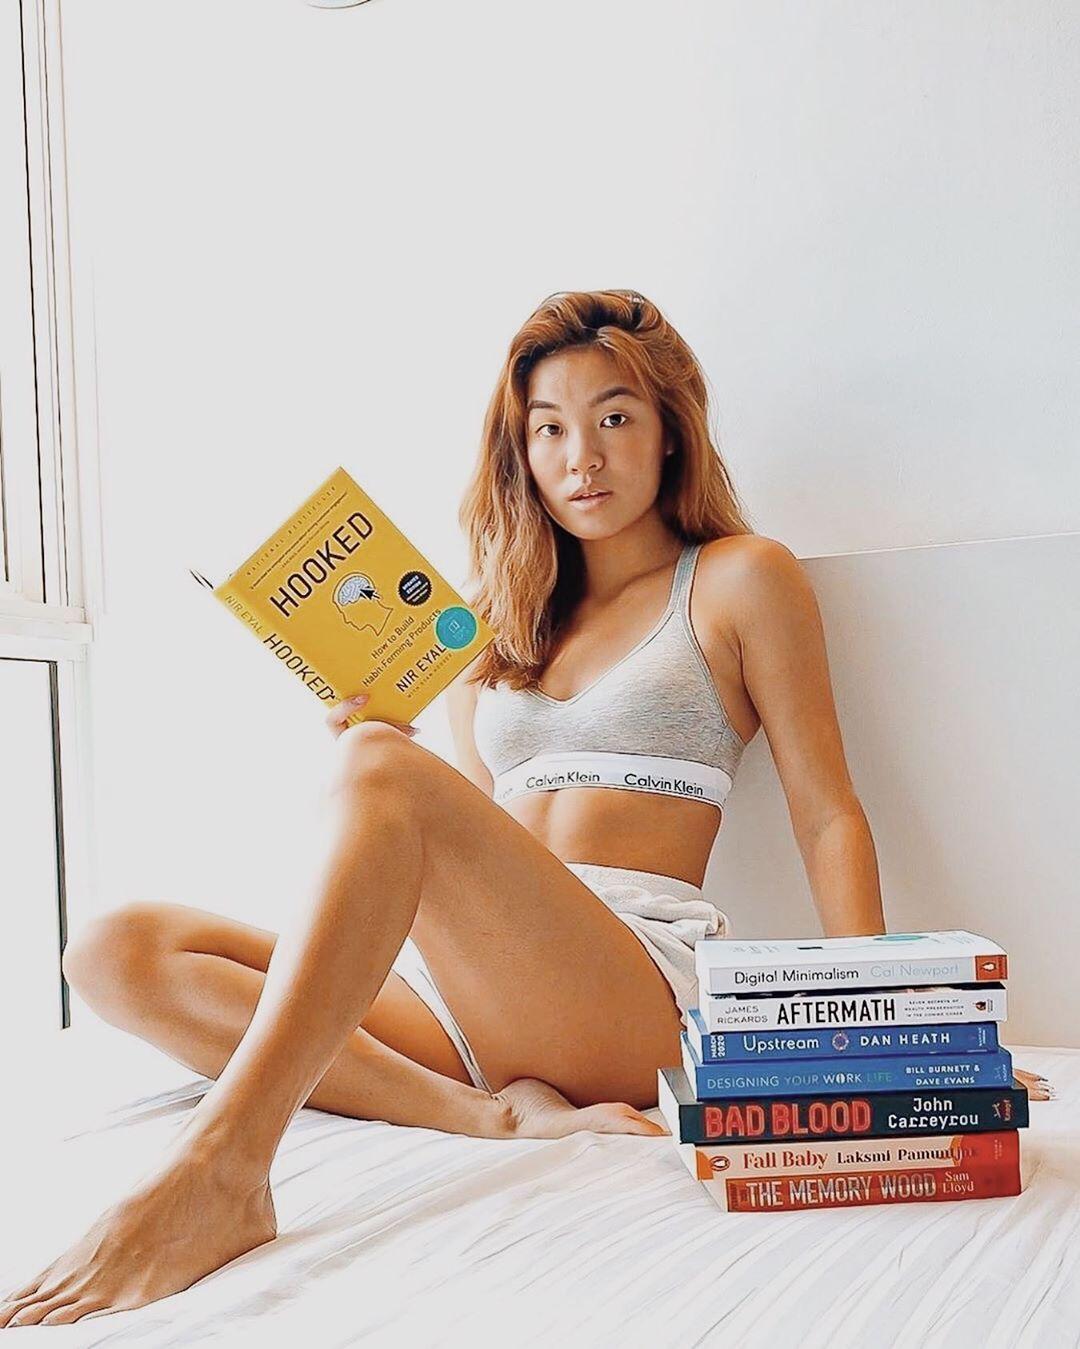 shannontaylortw - Singapore influencer - May 2020